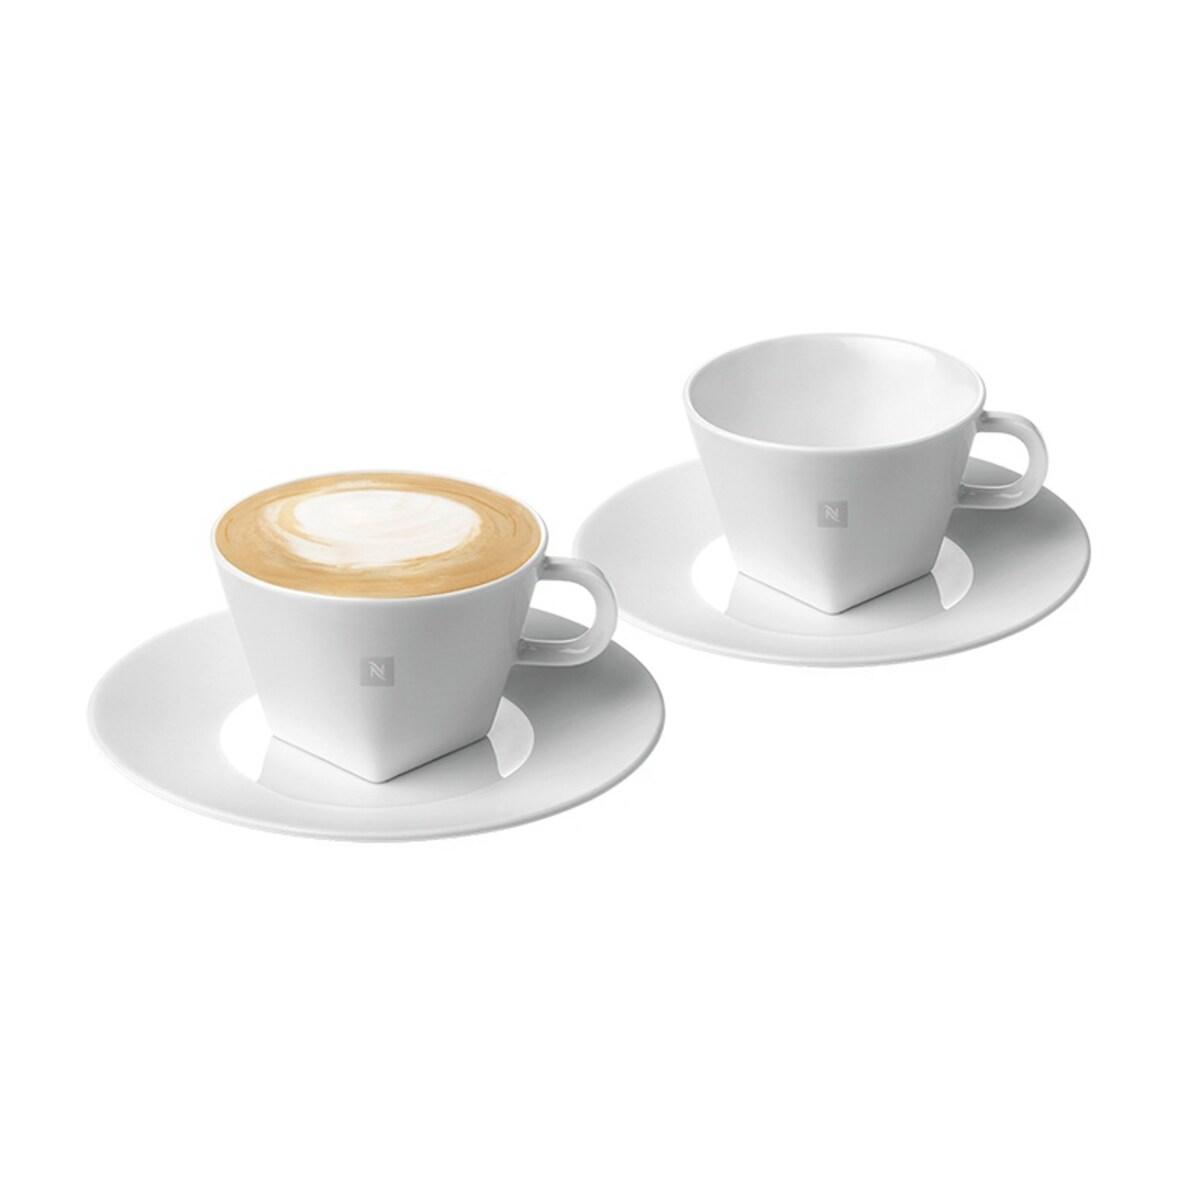 Nespresso Pure Cappuccino Collection - Комплект чаши за капучино, 2 бр